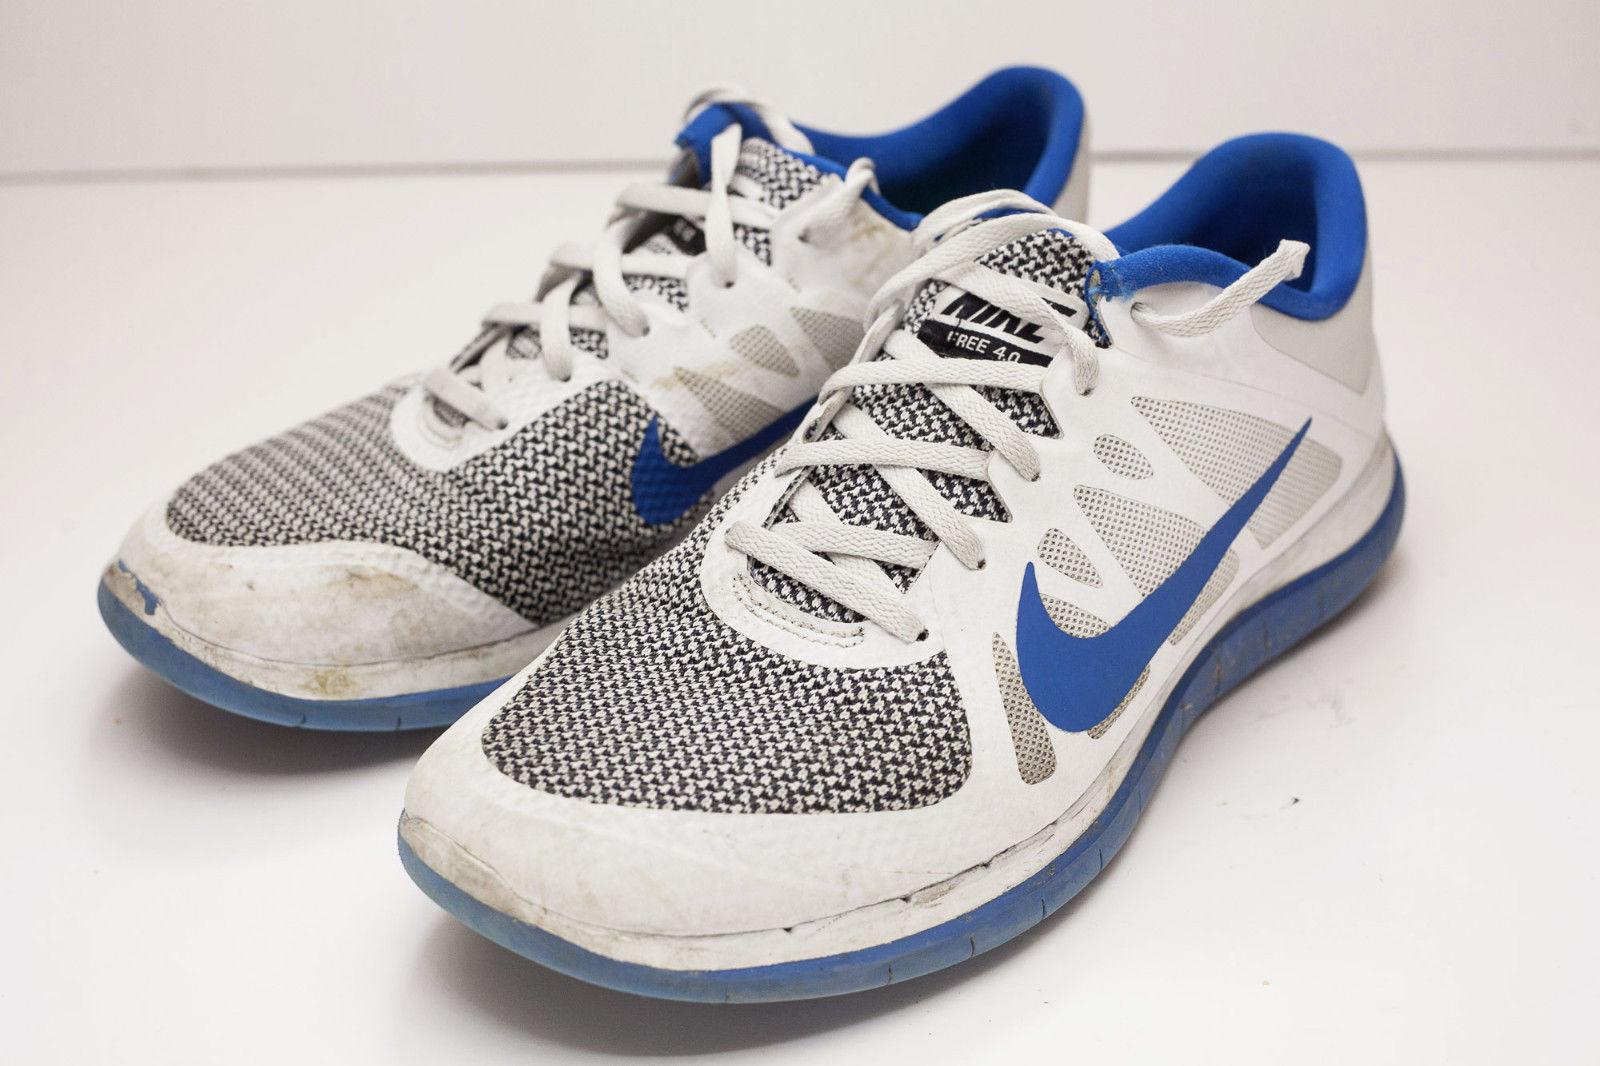 Nike Free 12 White Blue Men's Running Shoes